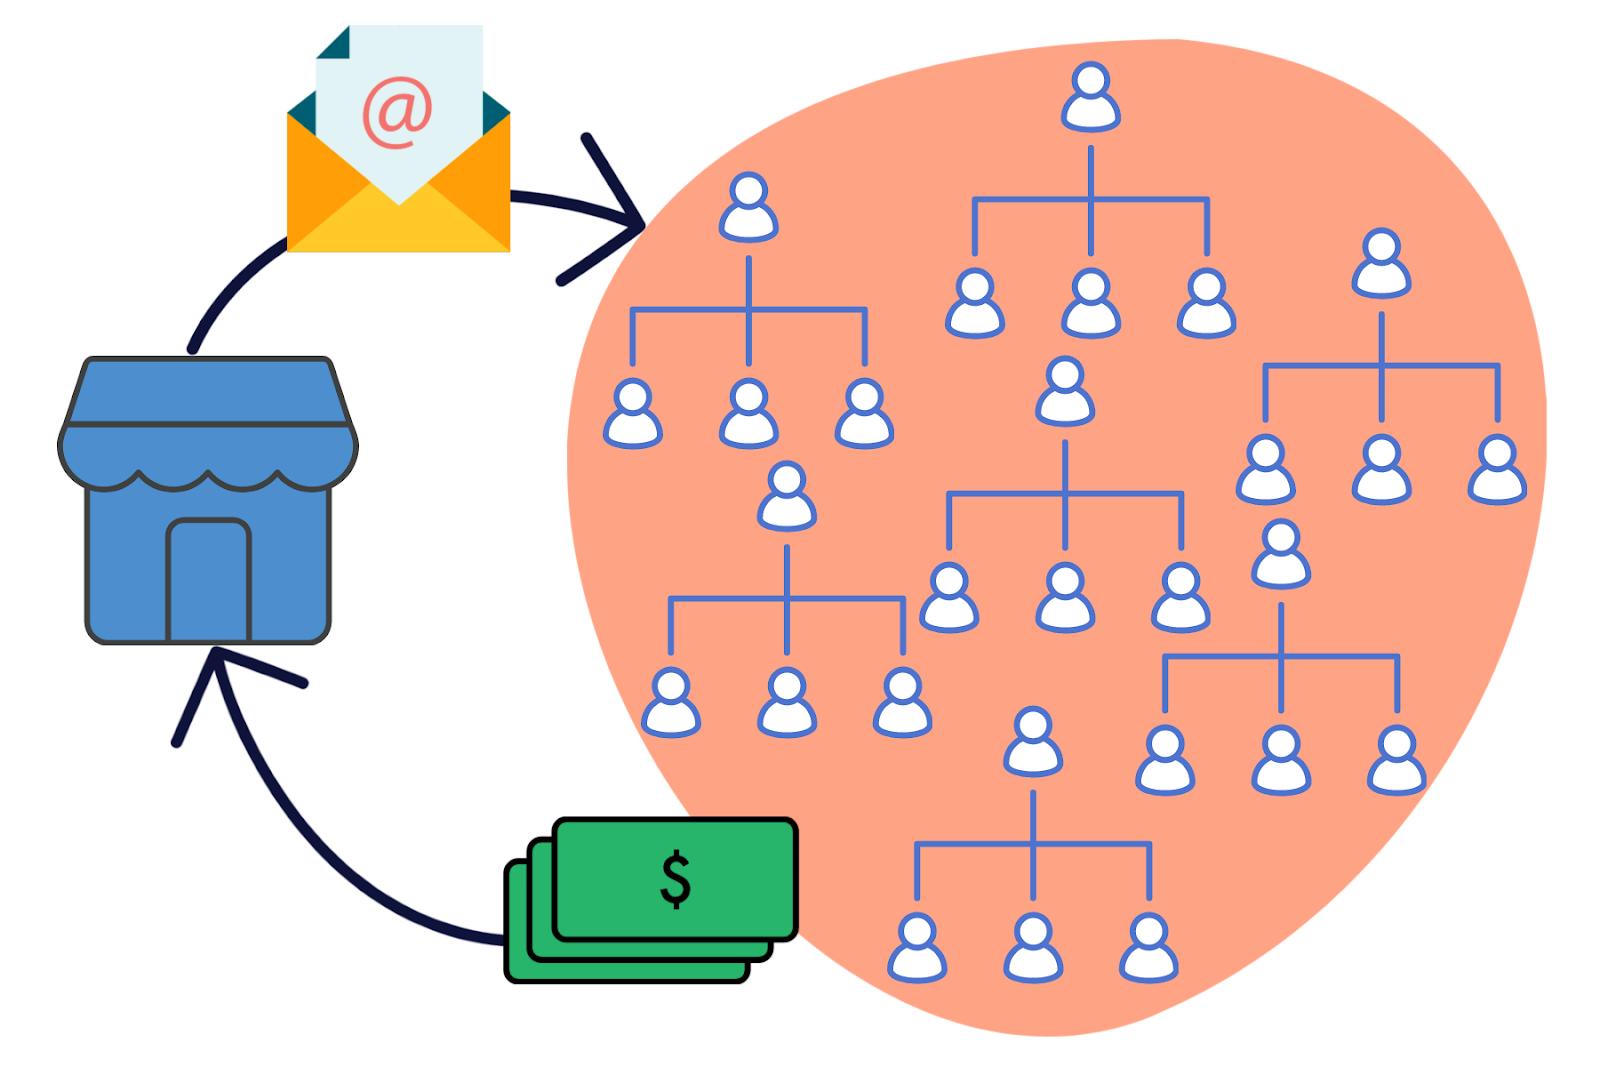 Peer to Peer Fundraising: The Smart Way to Grow